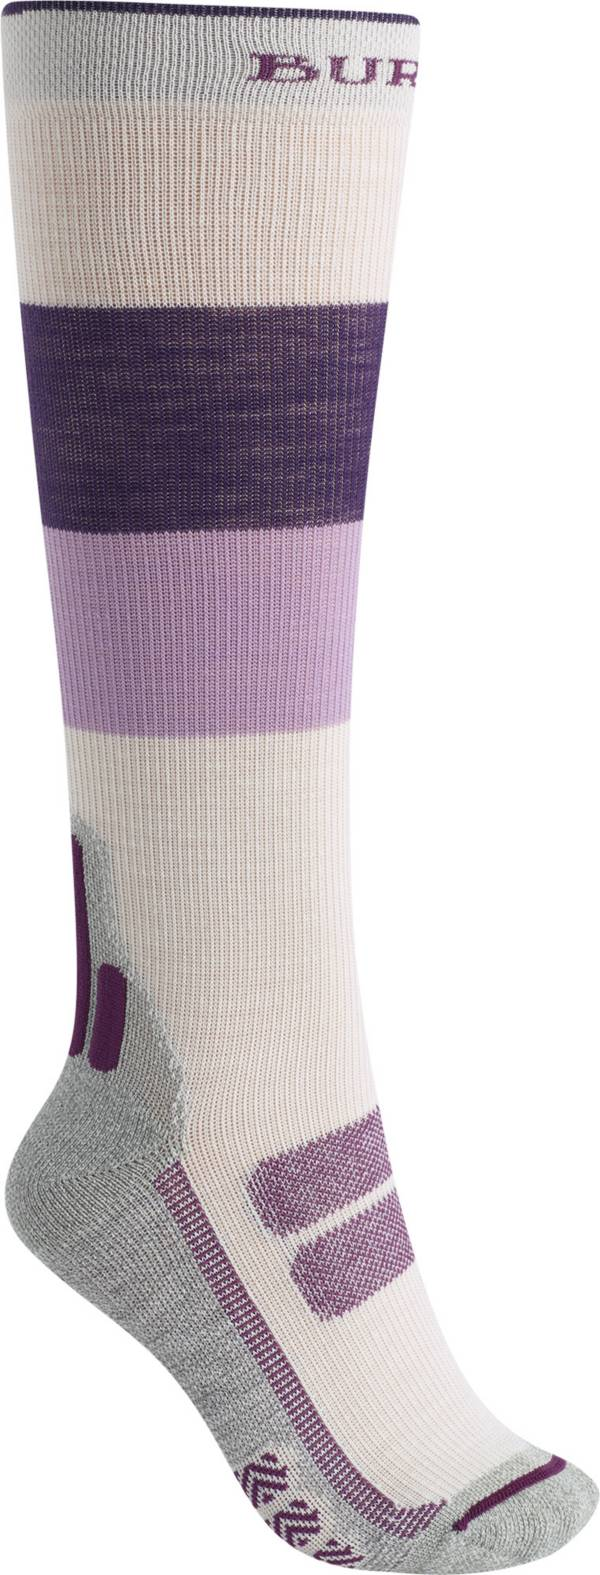 Burton Women's Performance Ultralight Compression Socks product image